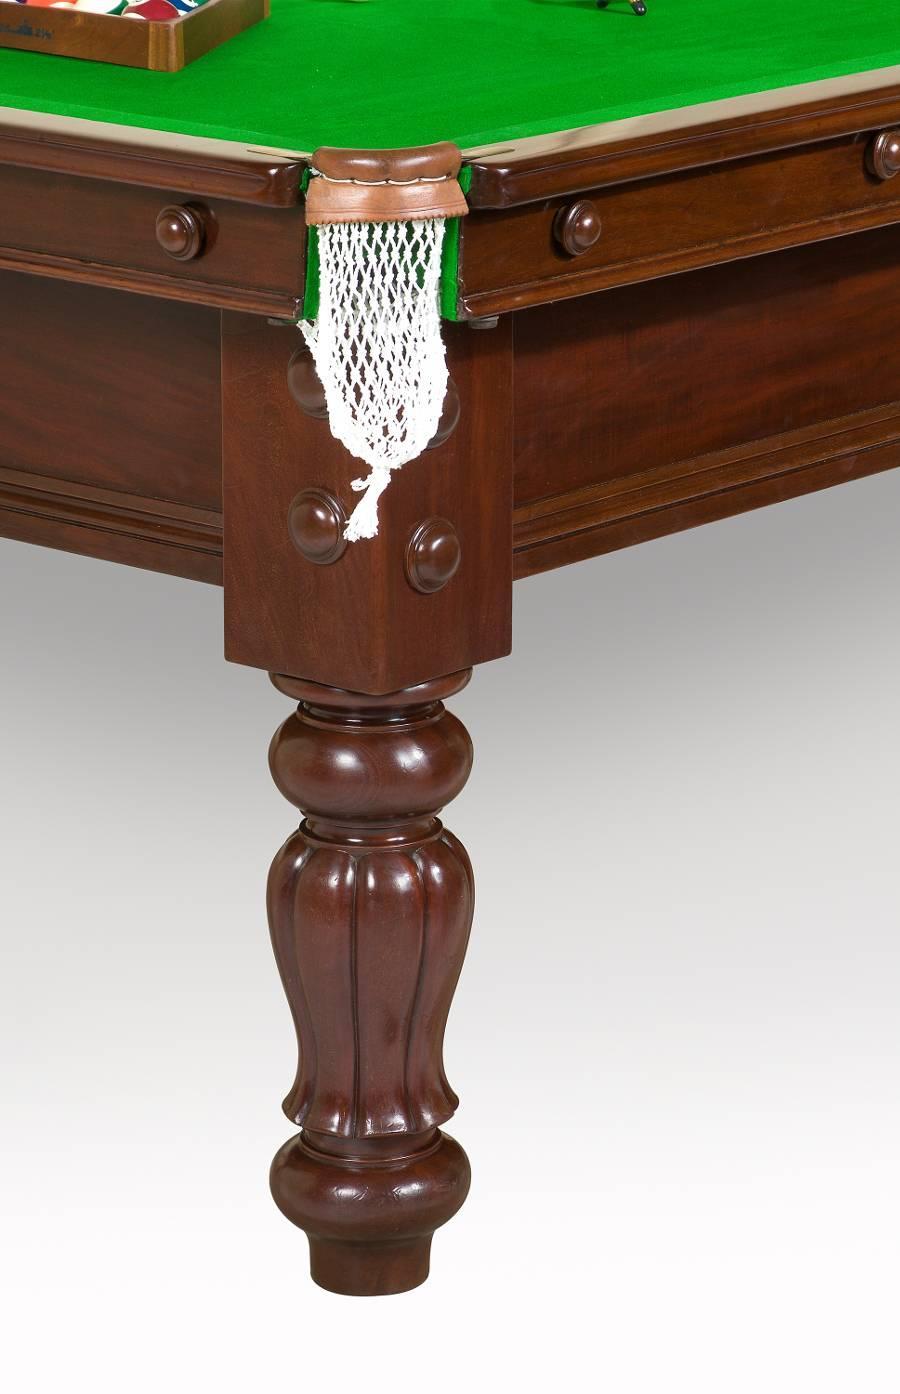 A Mahogany Three Quarter 9 Ft X 4.5 Ft English Billiard Table By Burroughs  U0026 Watts